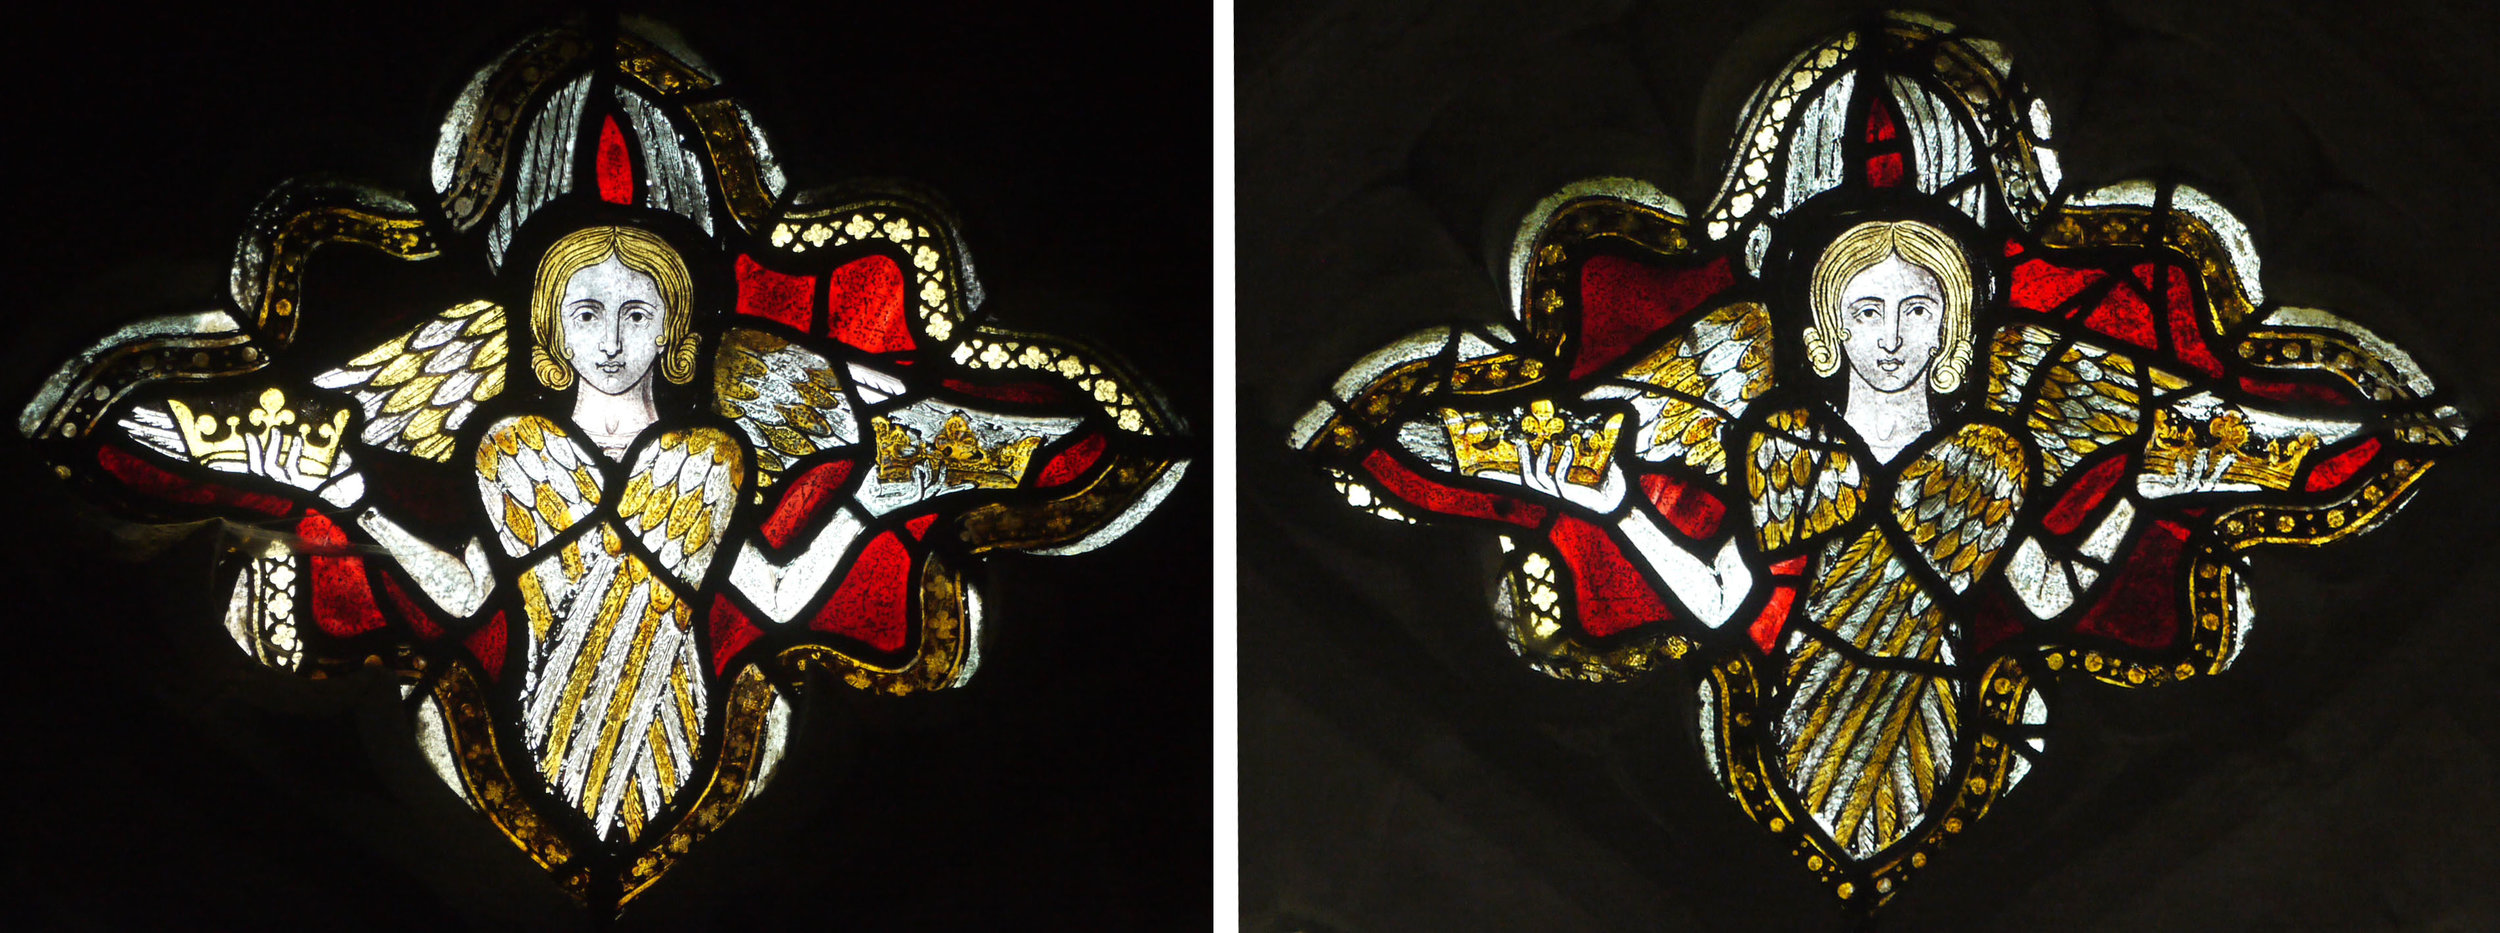 Seraphim in the chancel